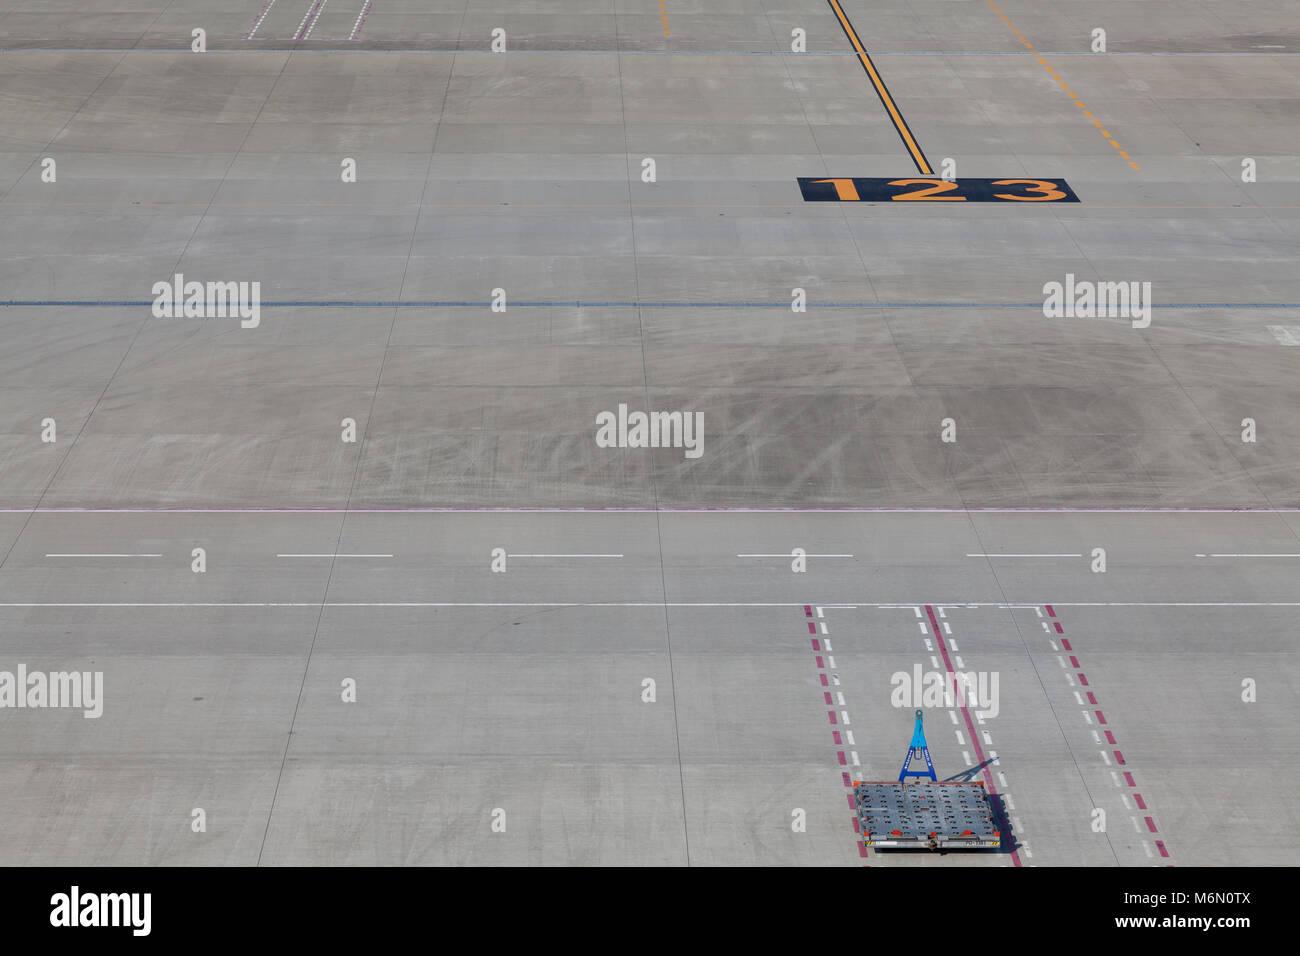 Runway and apron details at Haneda International Airport Terminal, Tokyo, Japan Thursday July 31st 2014 - Stock Image